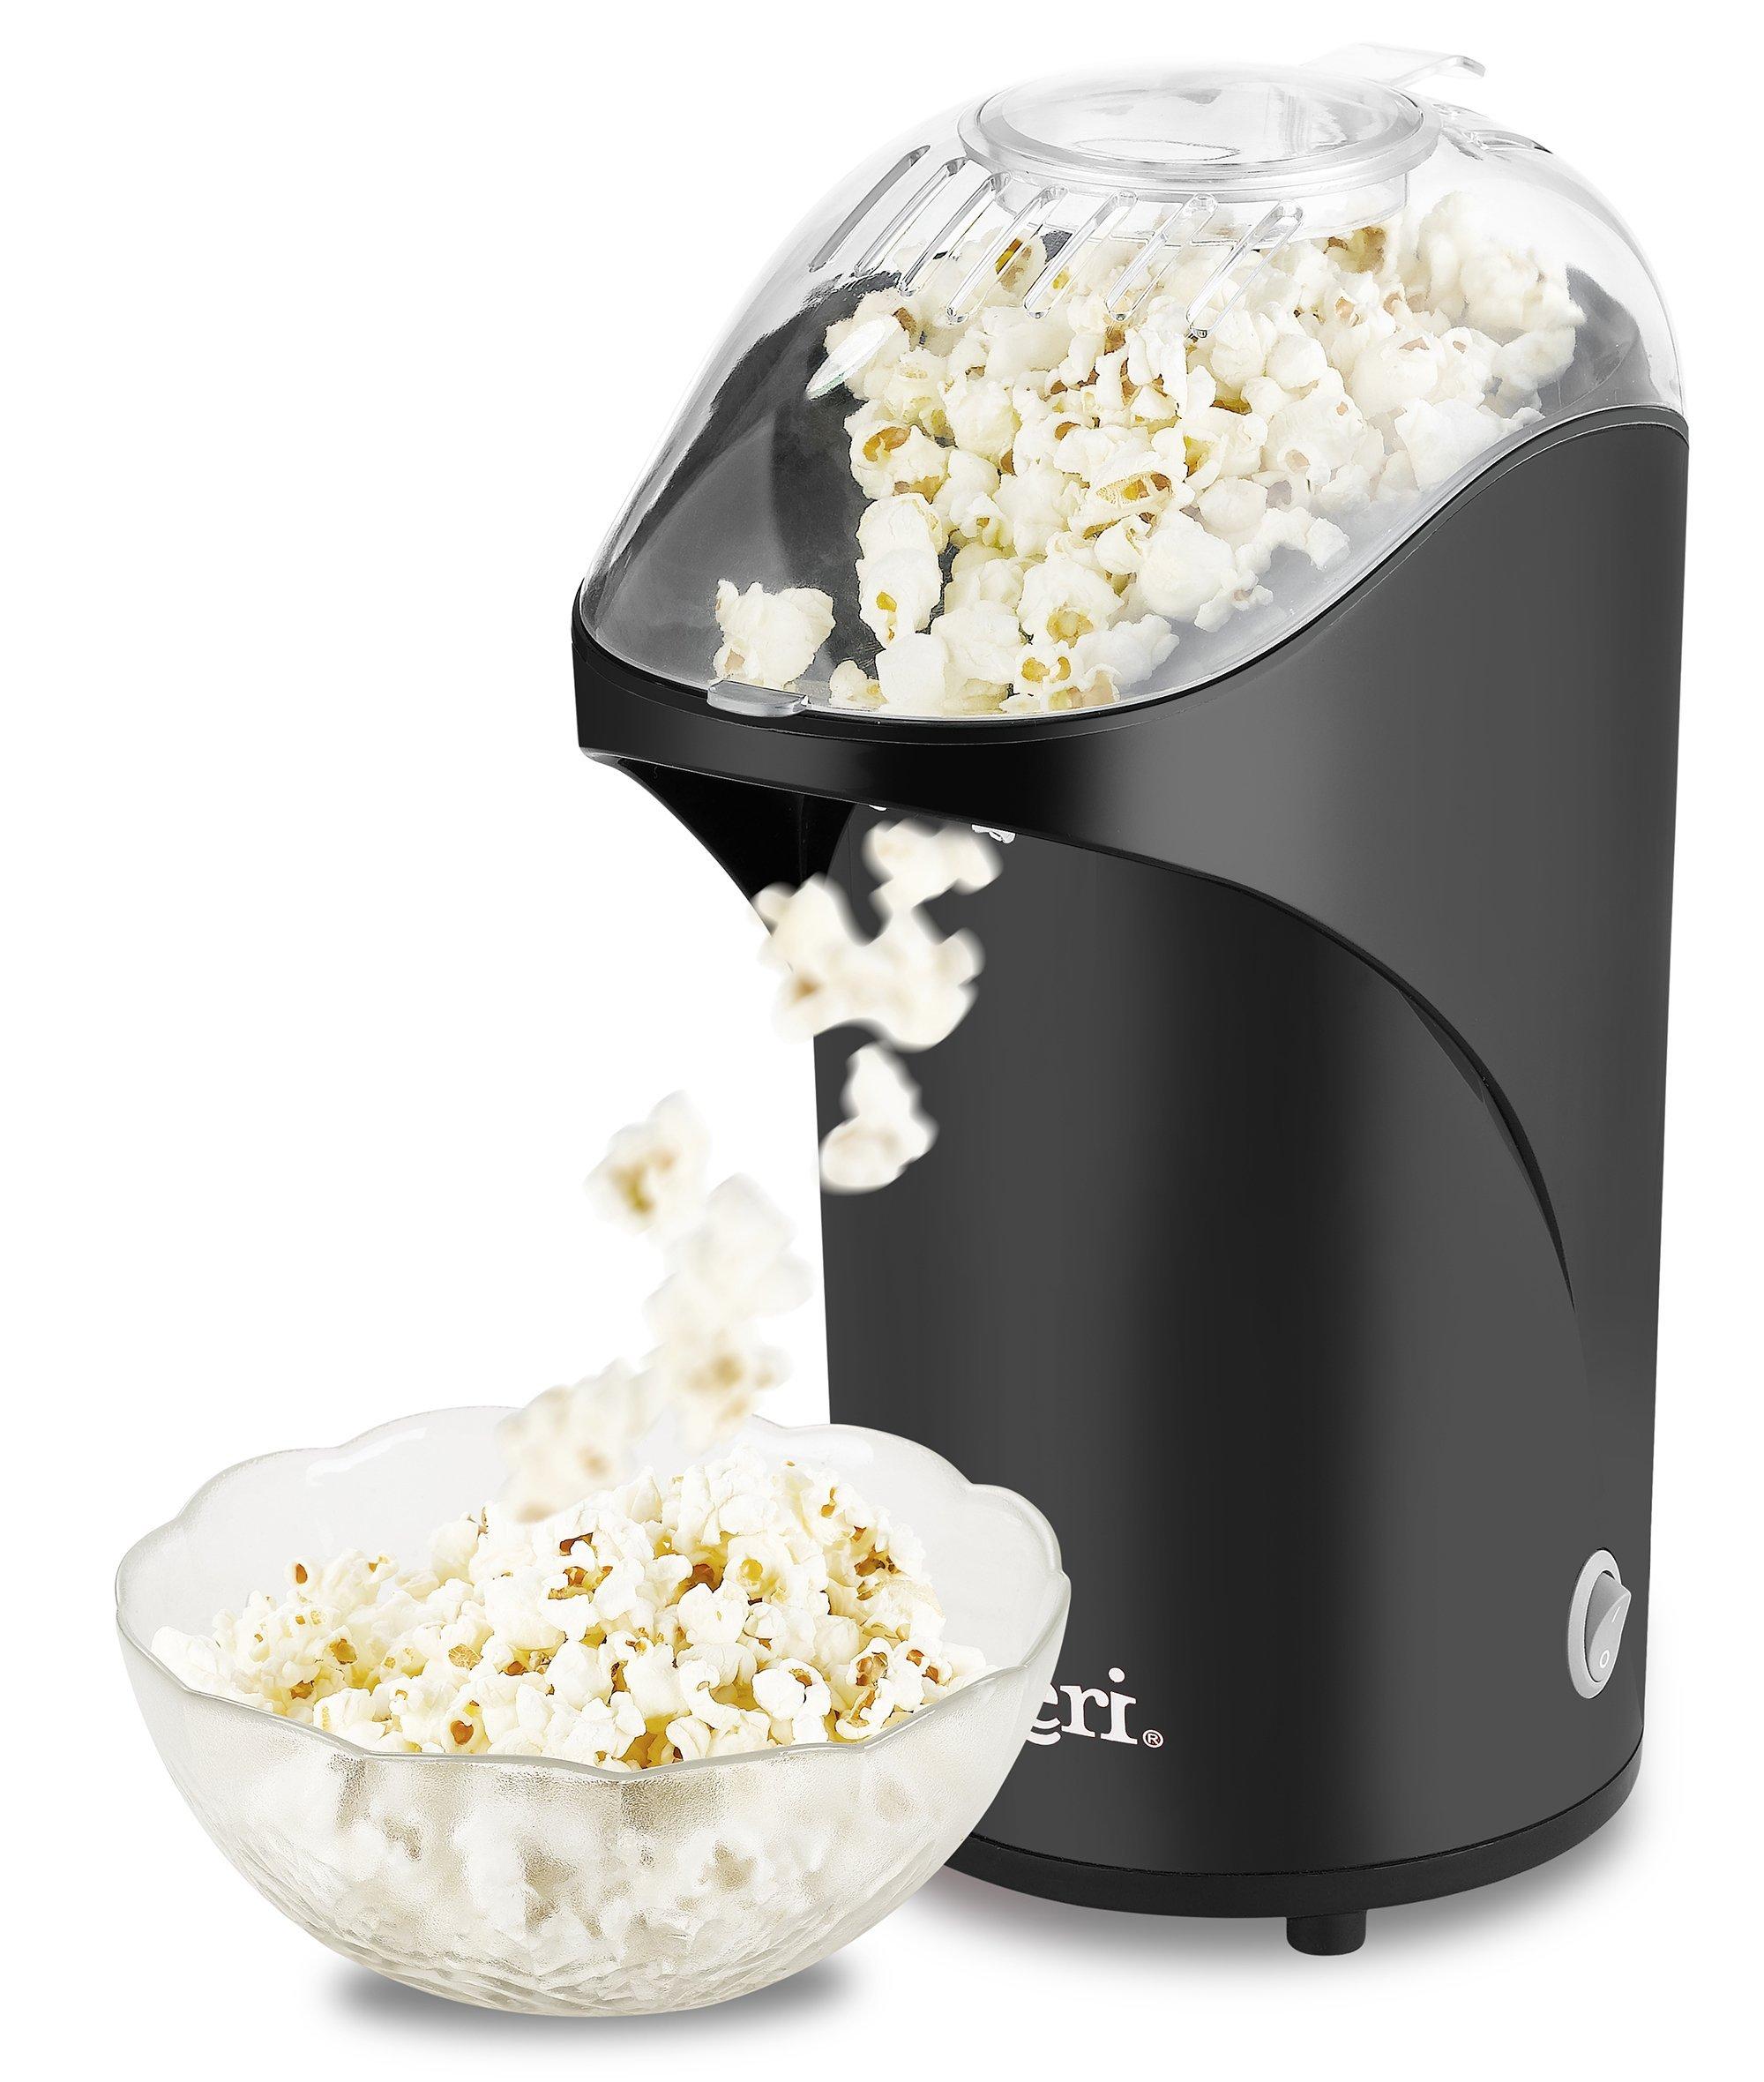 Ozeri OZP1-B2 Movietime II 26 Cup Healthy Popcorn Maker, One Size, Black